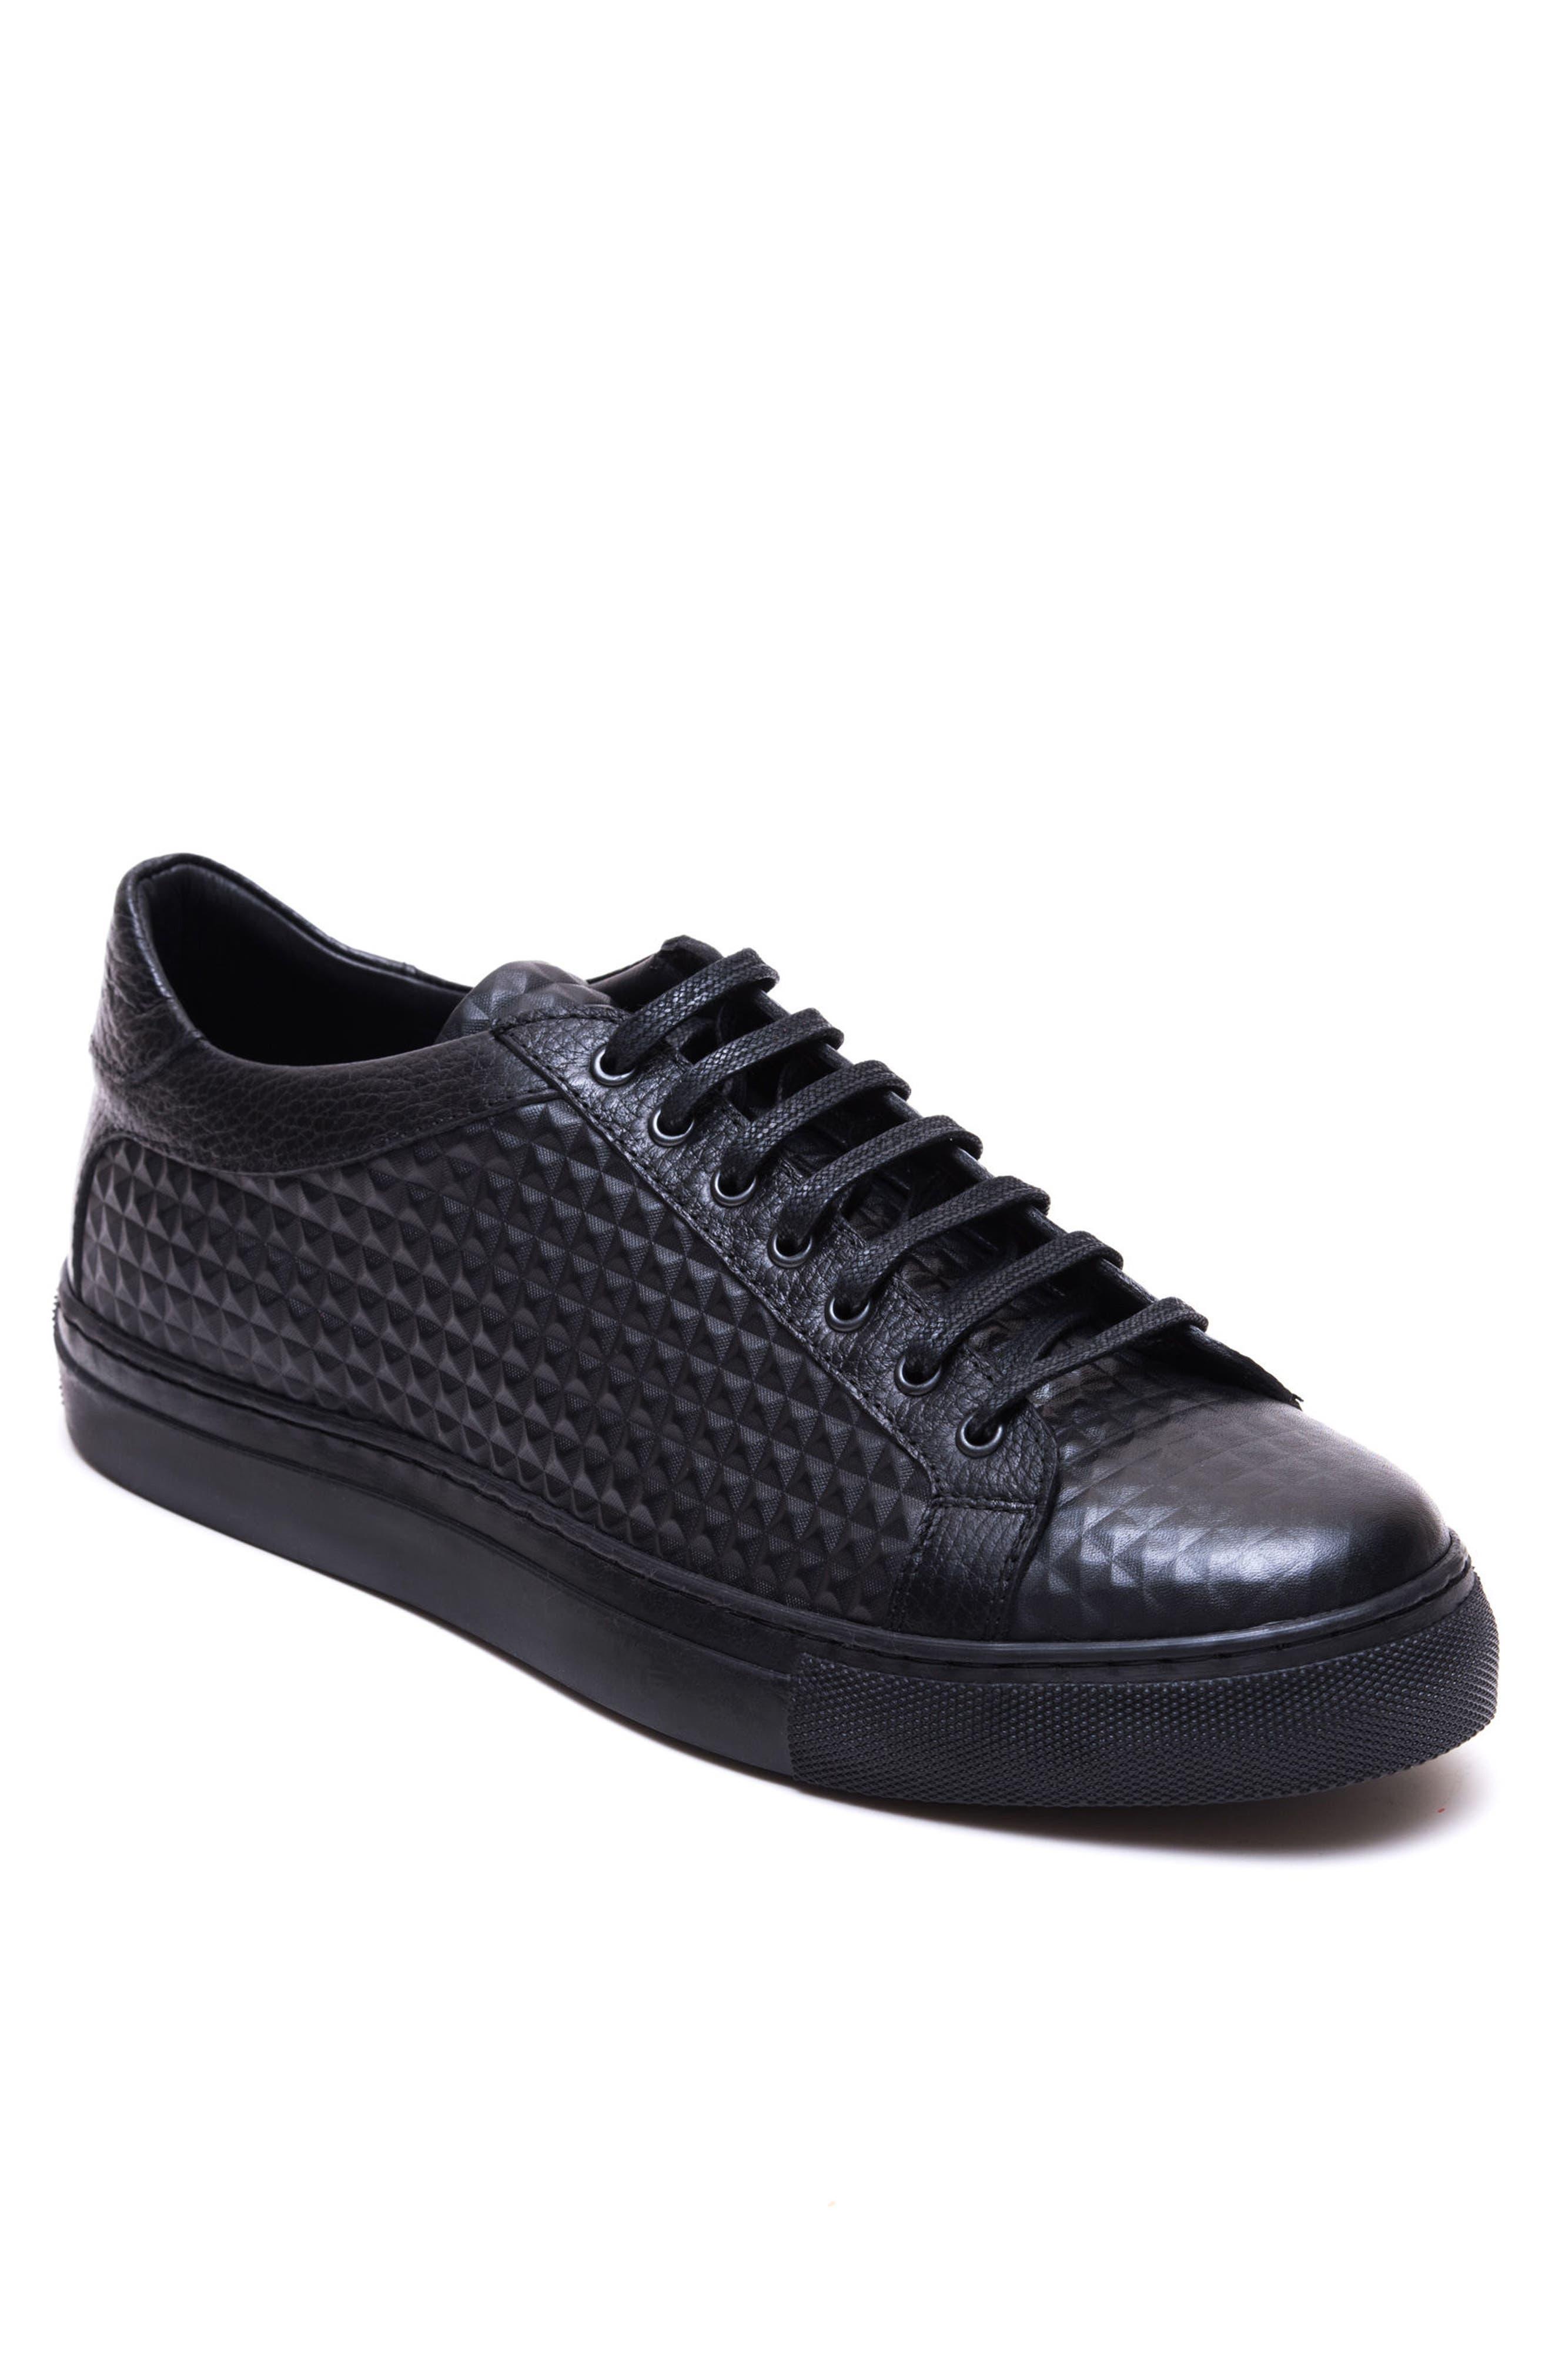 Scott Leather Sneaker,                         Main,                         color,